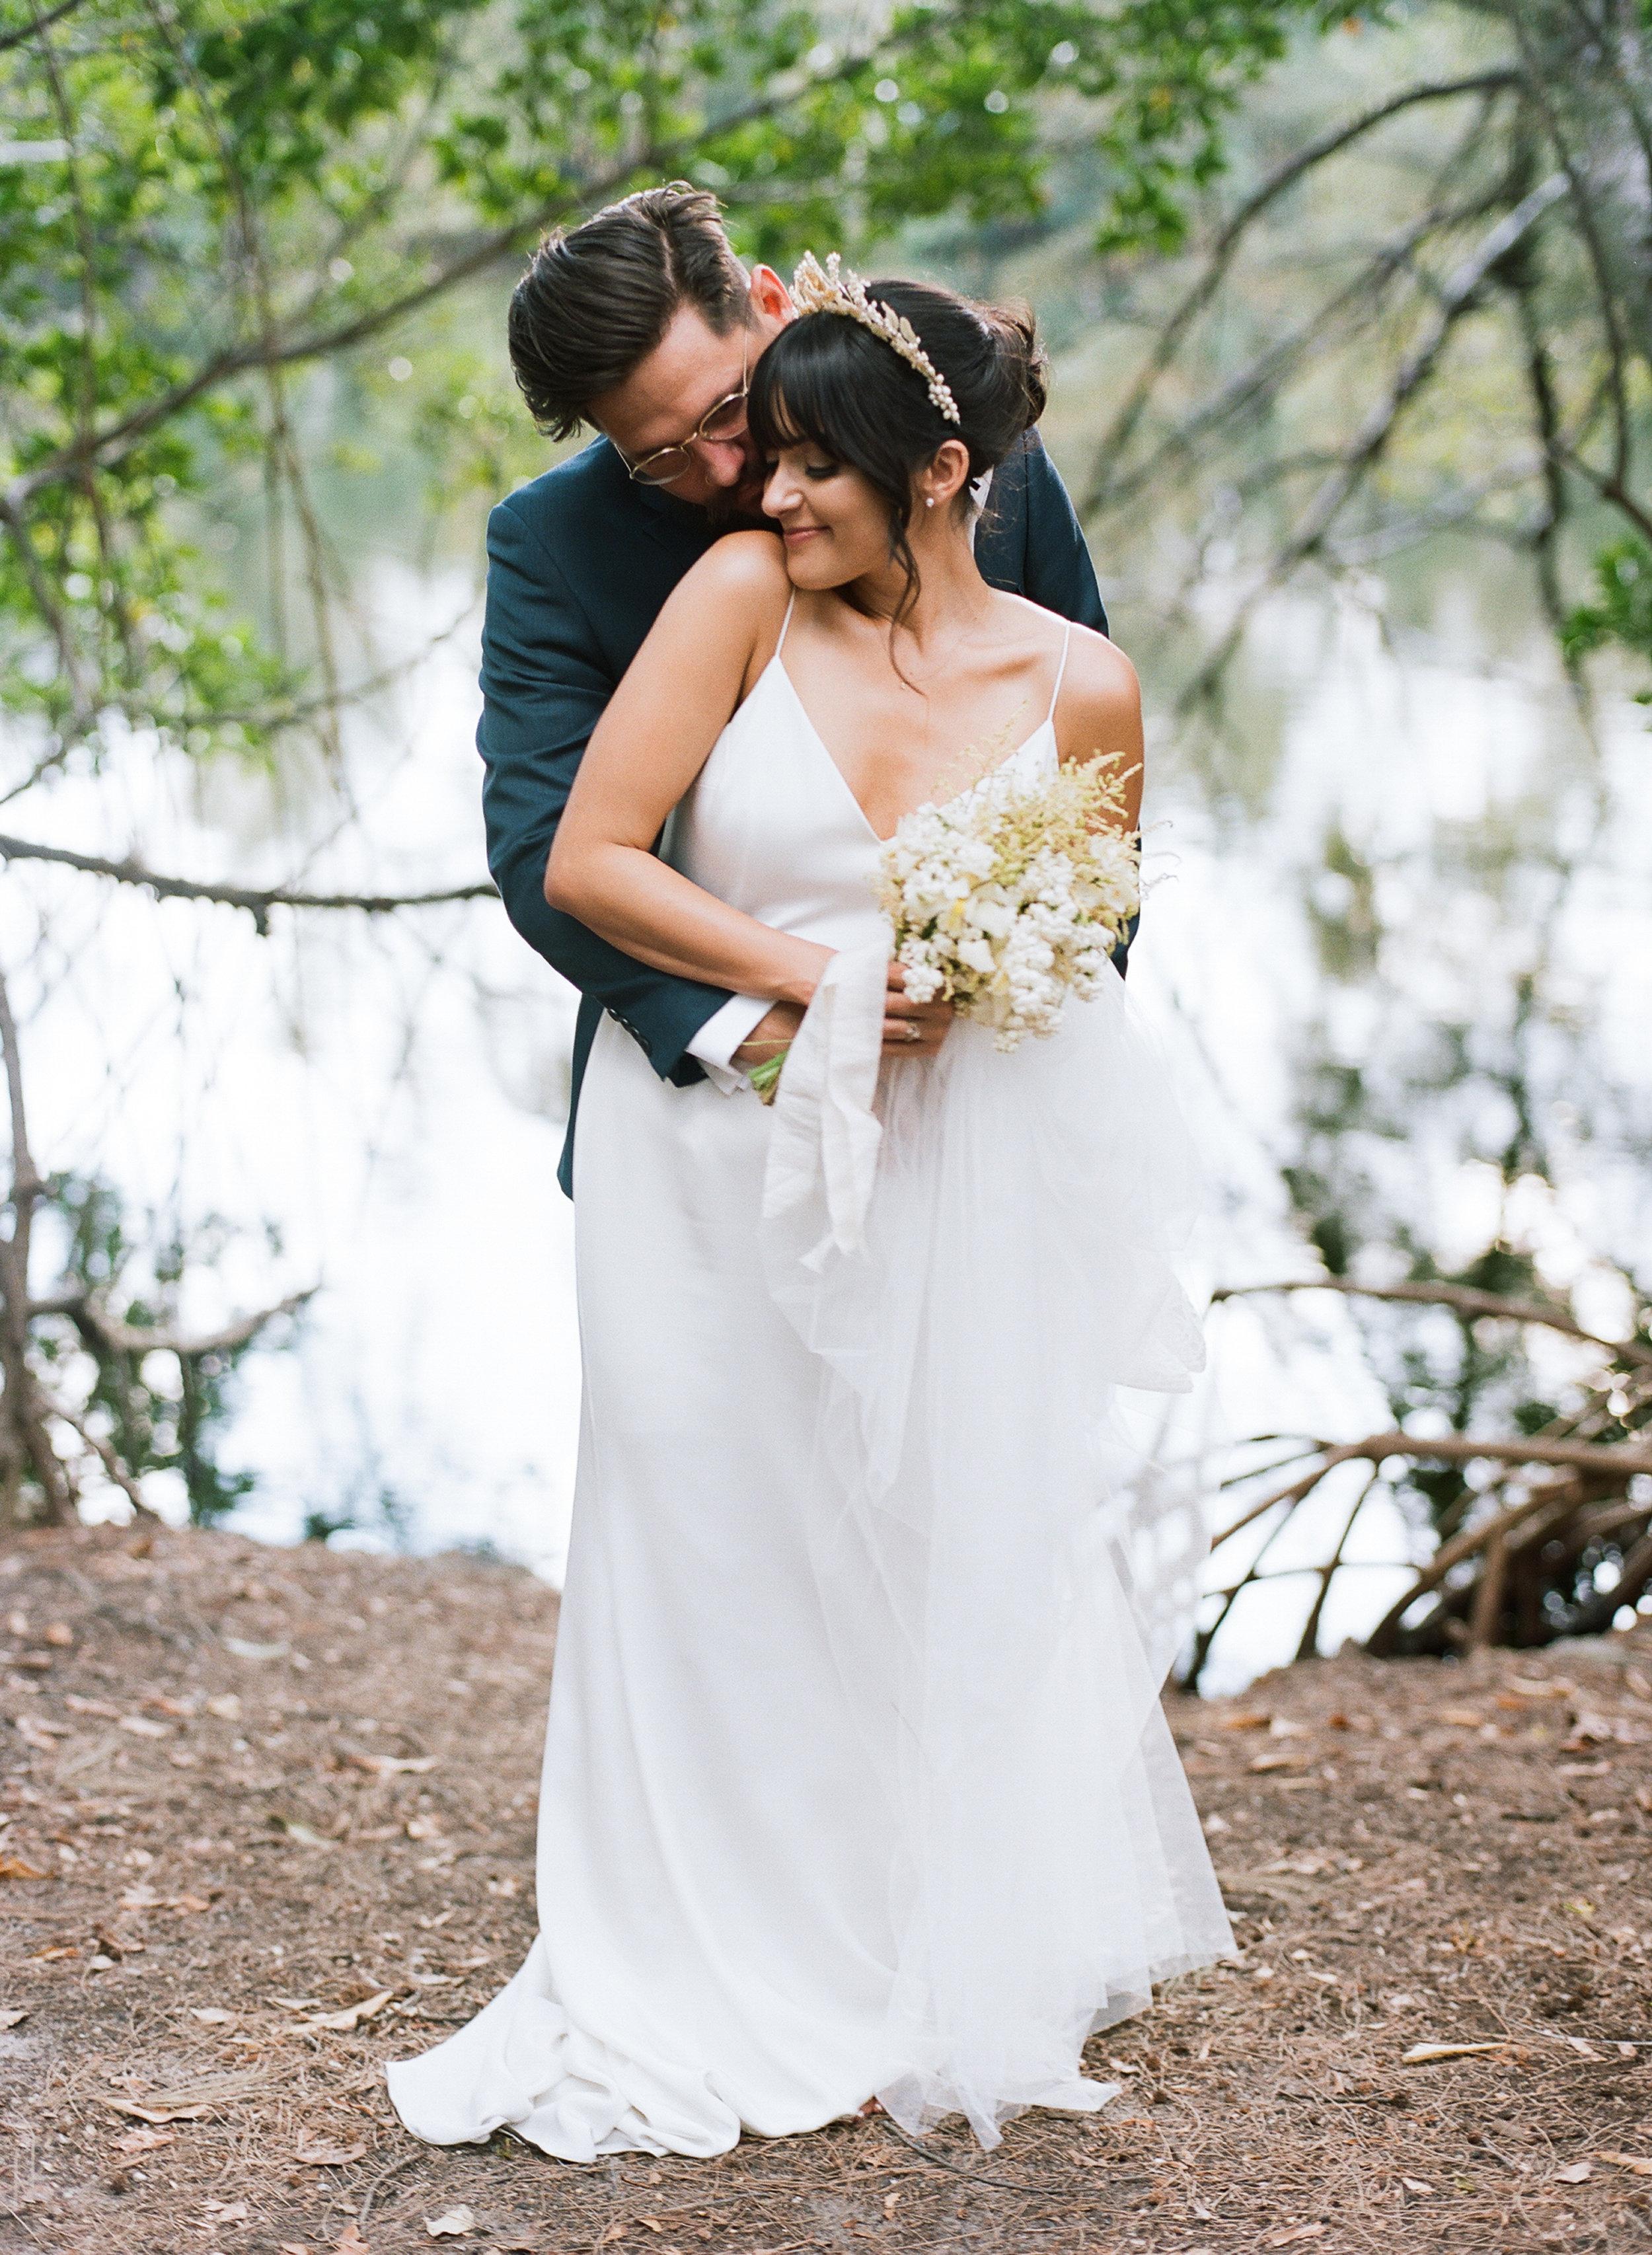 42-lakefront-wedding-portrait.jpg